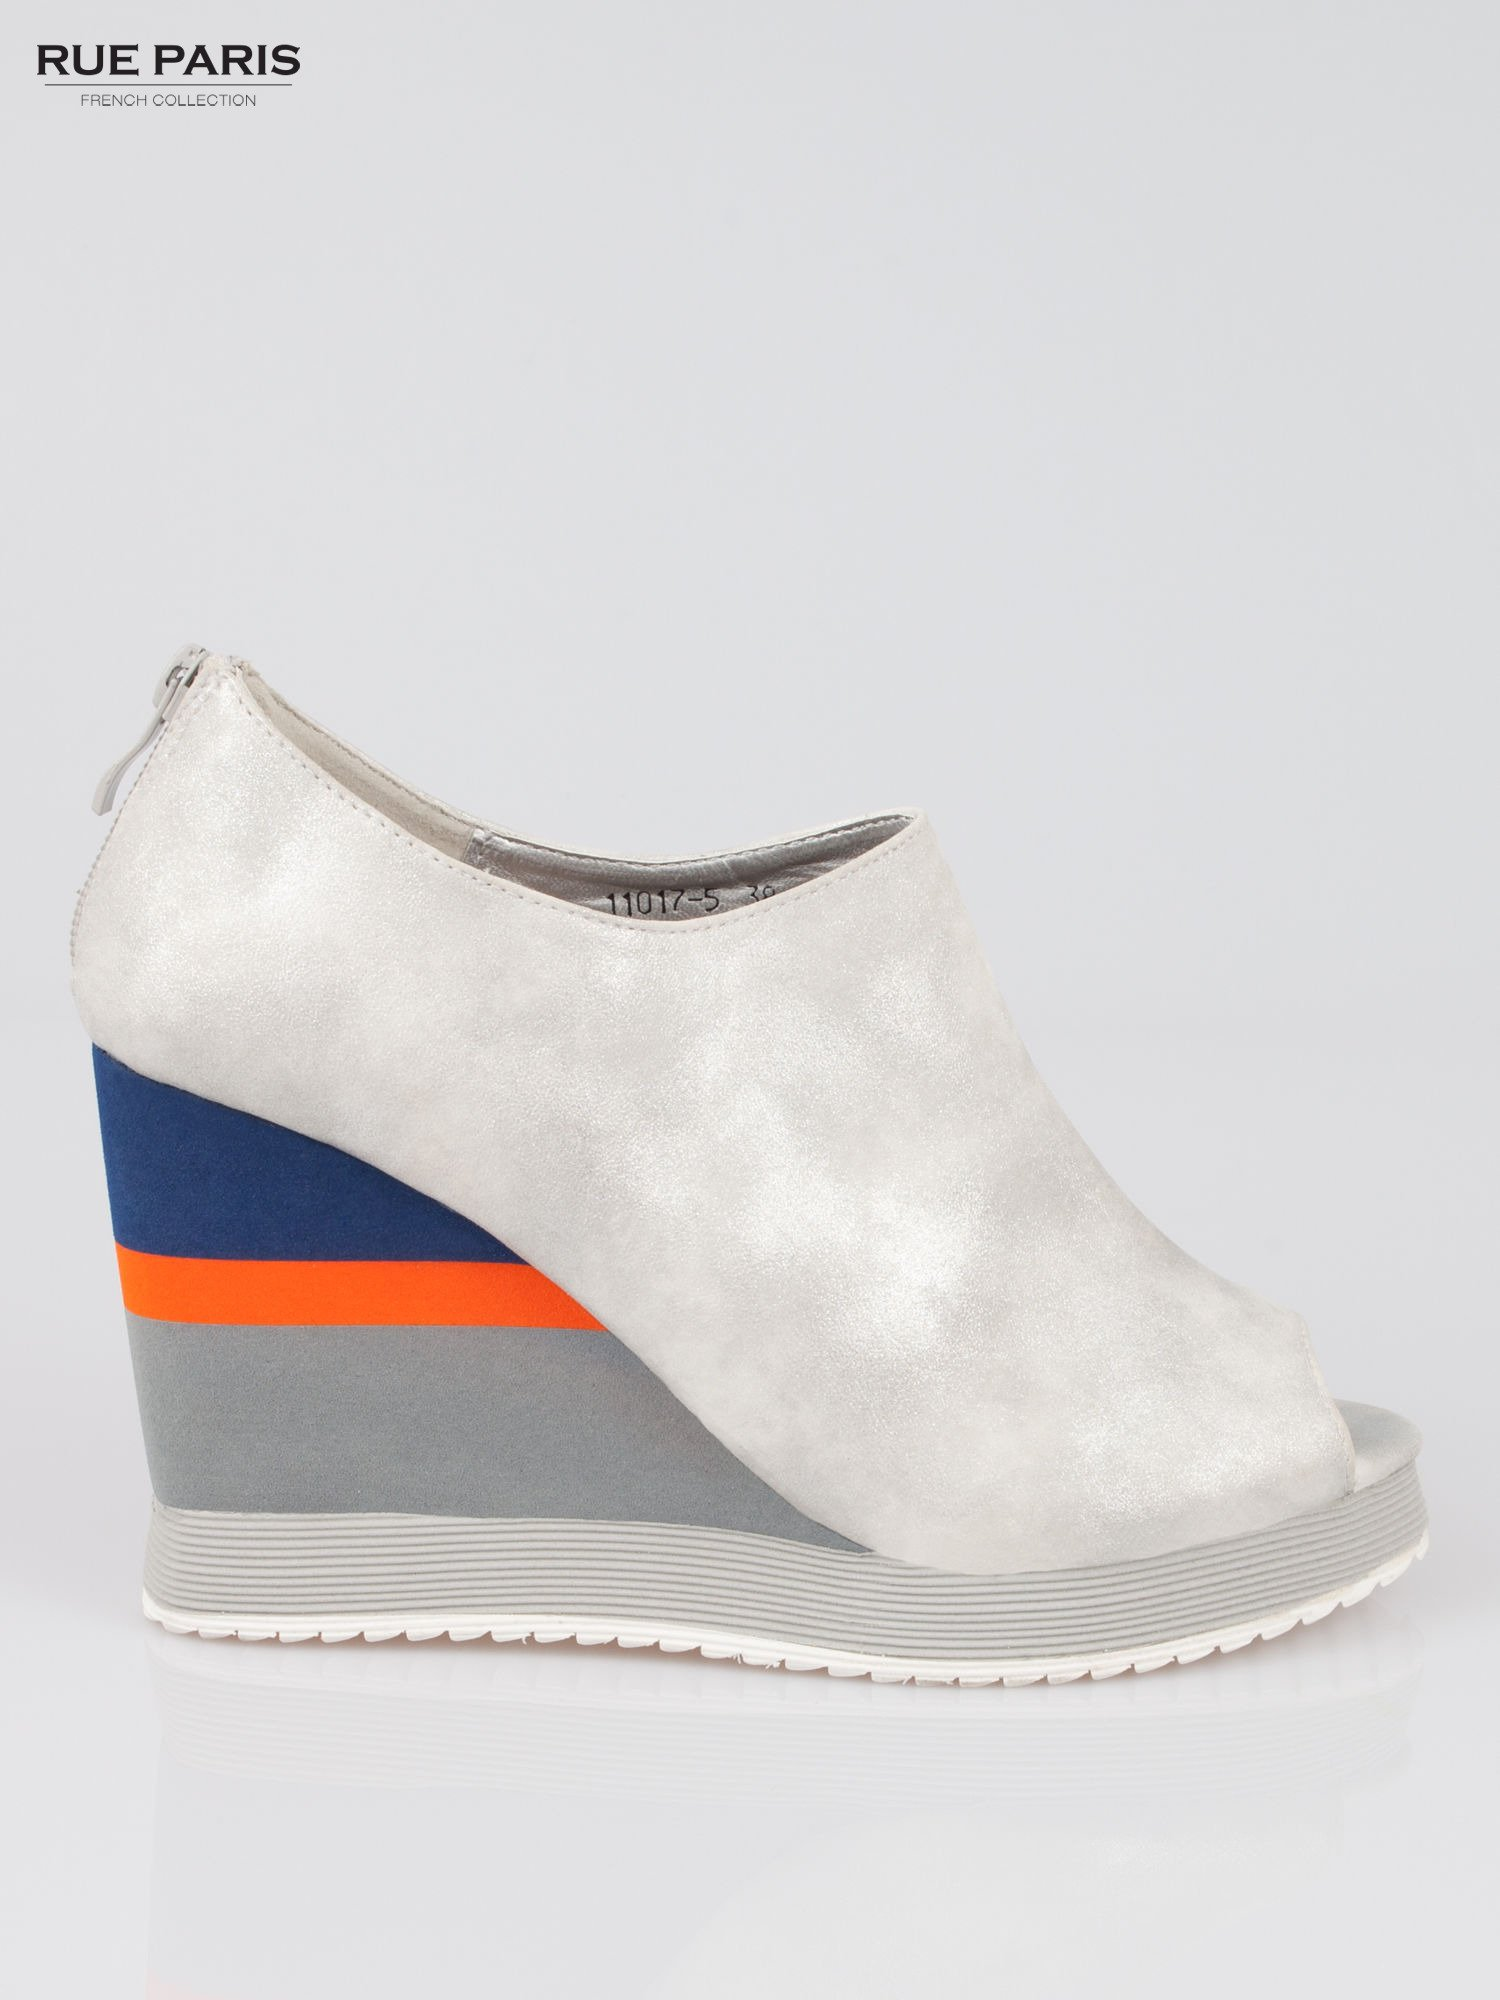 Szare buty open toe na koturnie w paski                                  zdj.                                  1